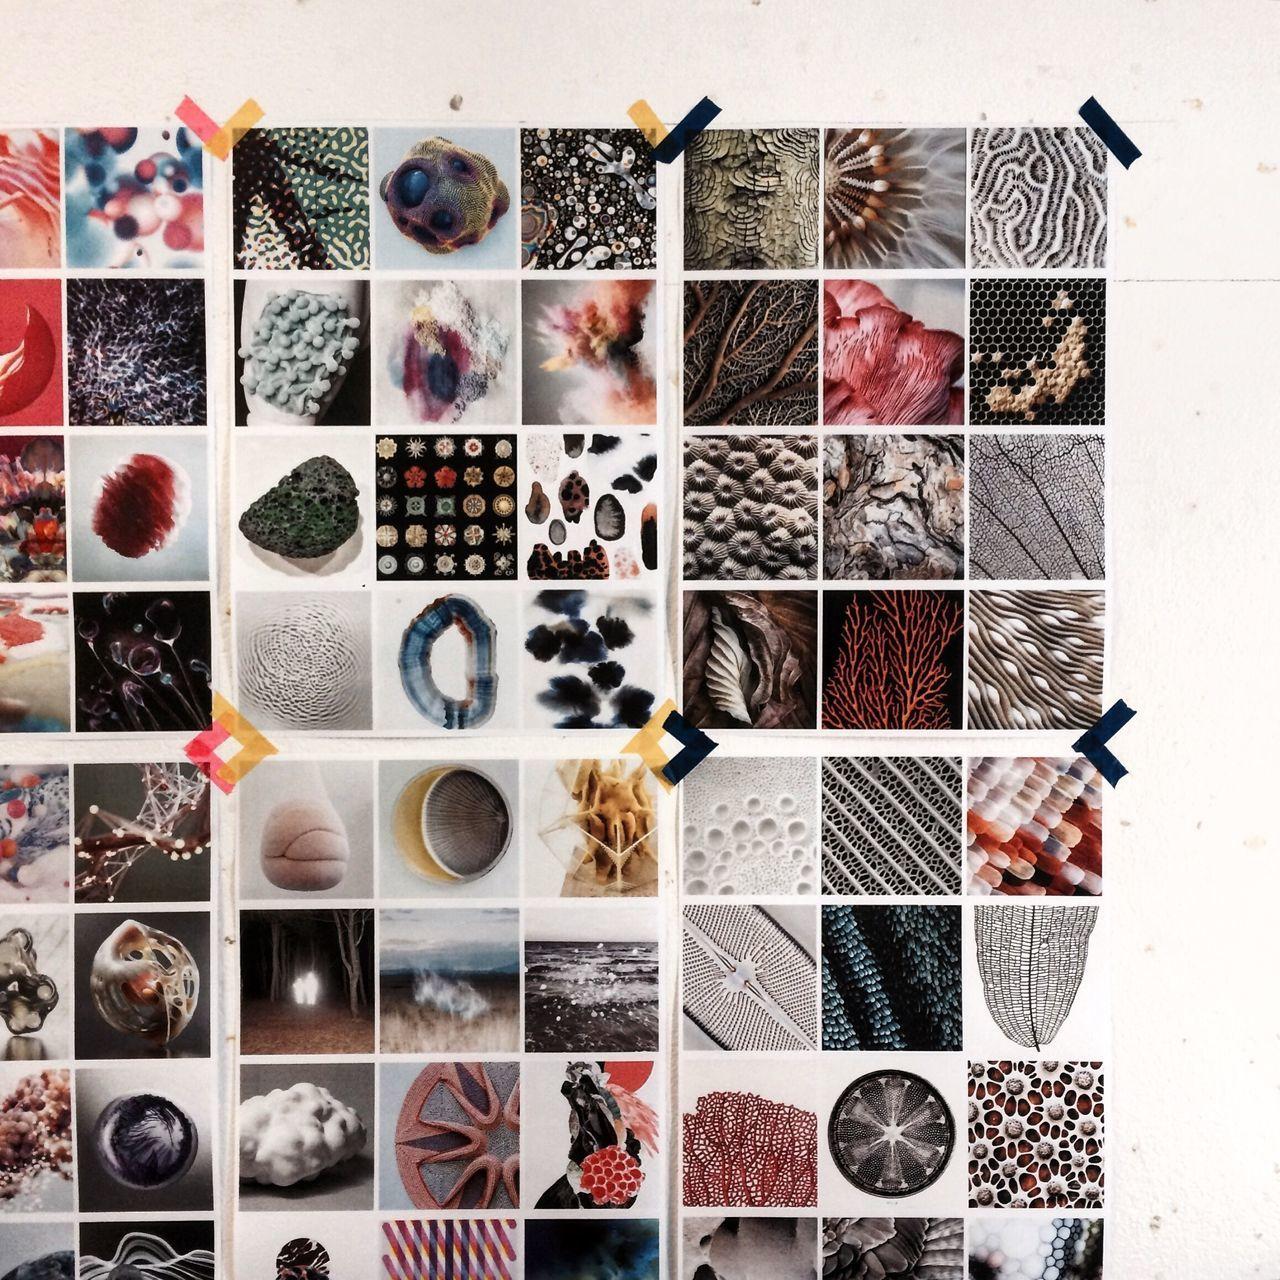 Pattern Variation No People Indoors  Day Inspiration Wallpaper DIY EyeEmNewHere Brainstorming Work Work In Progress Point Of View